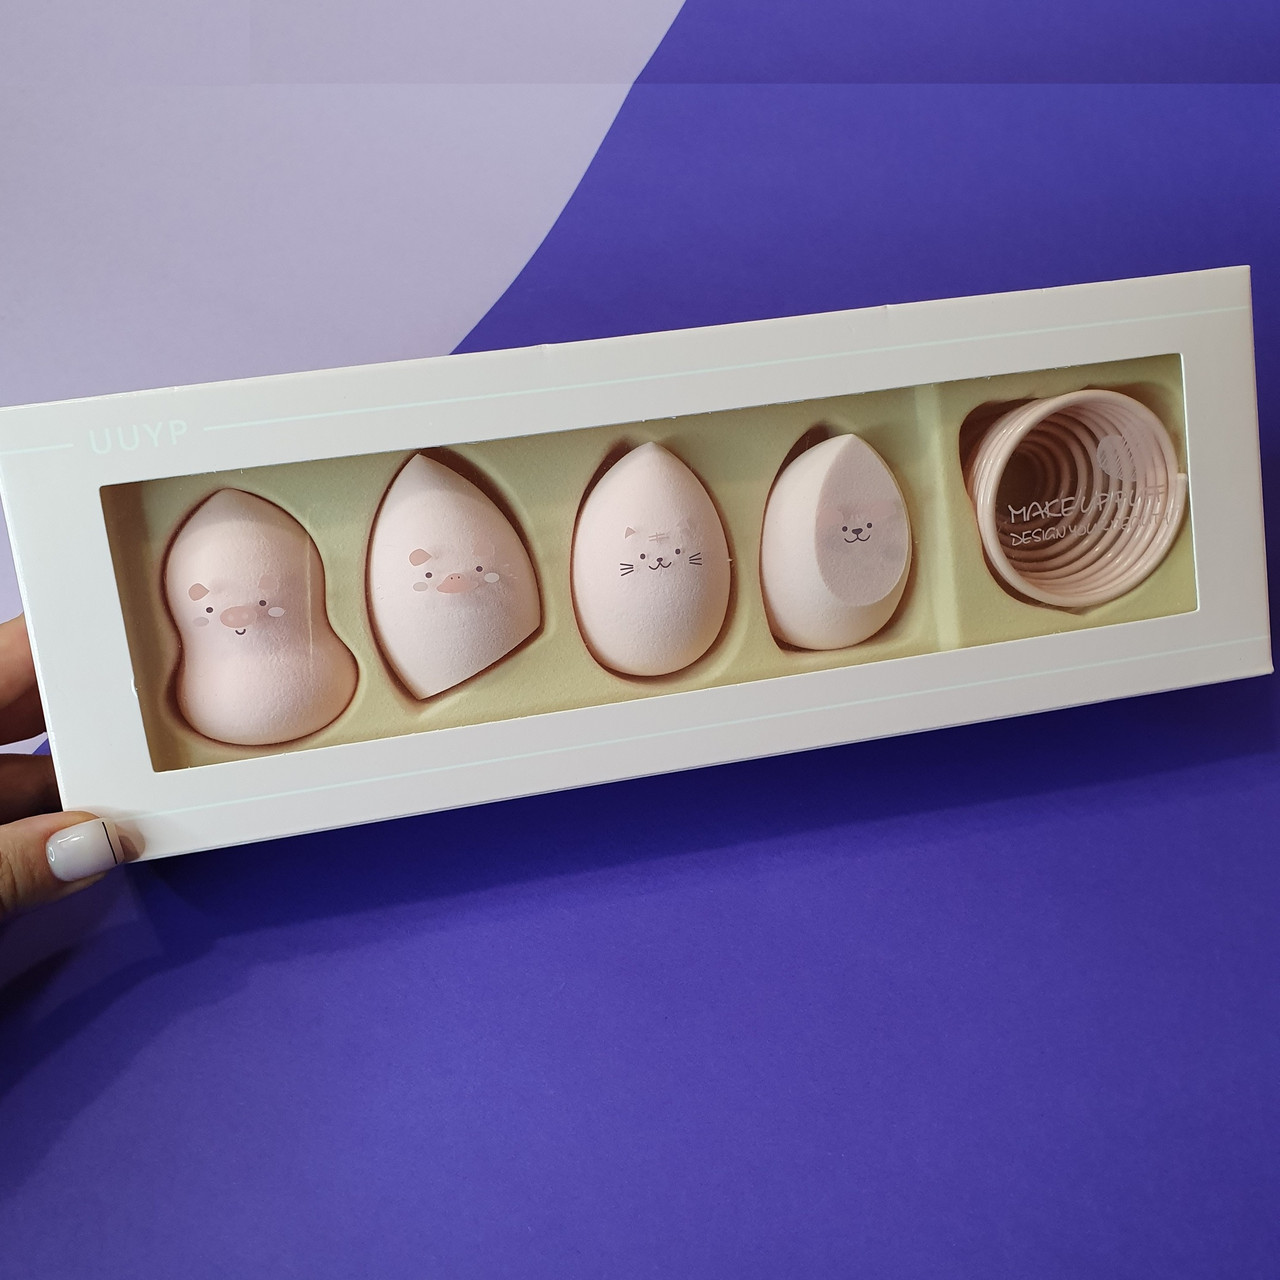 Набор спонжей с подставкой Make Up Puff Design Your Beauty (4 спонжа и 1 подставка)